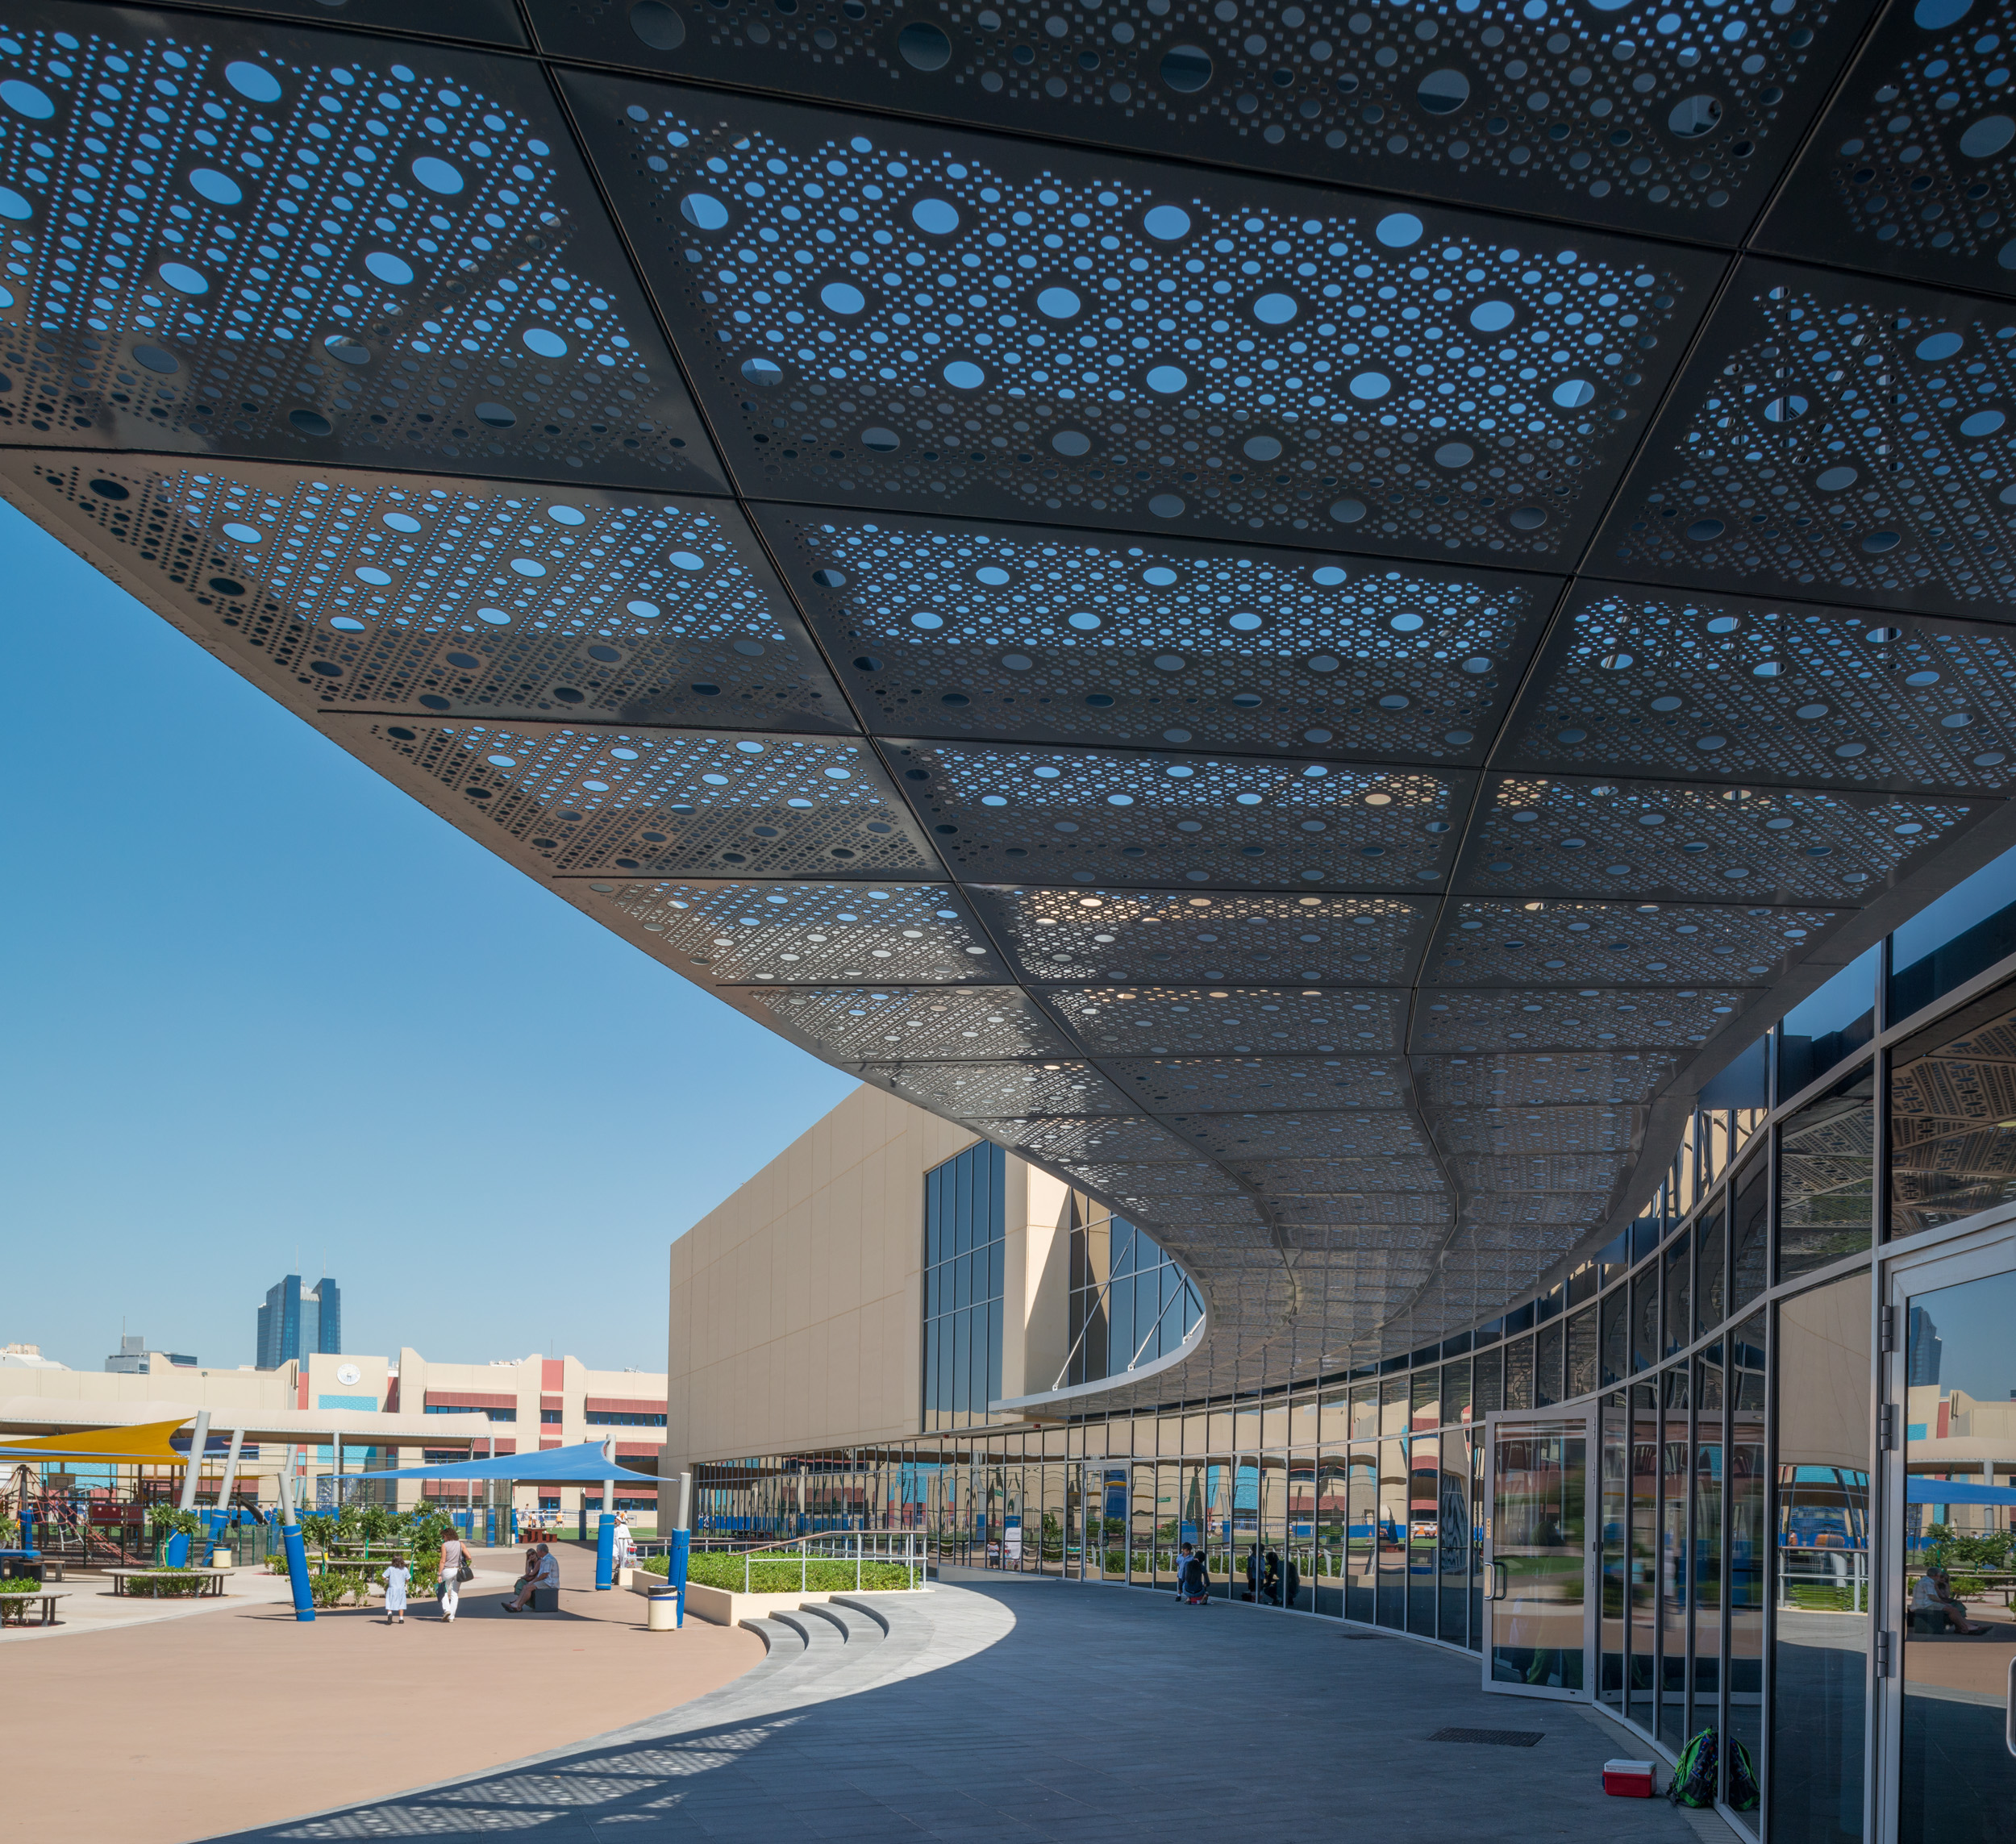 The British School - Al Khubairat, Abu Dhabi